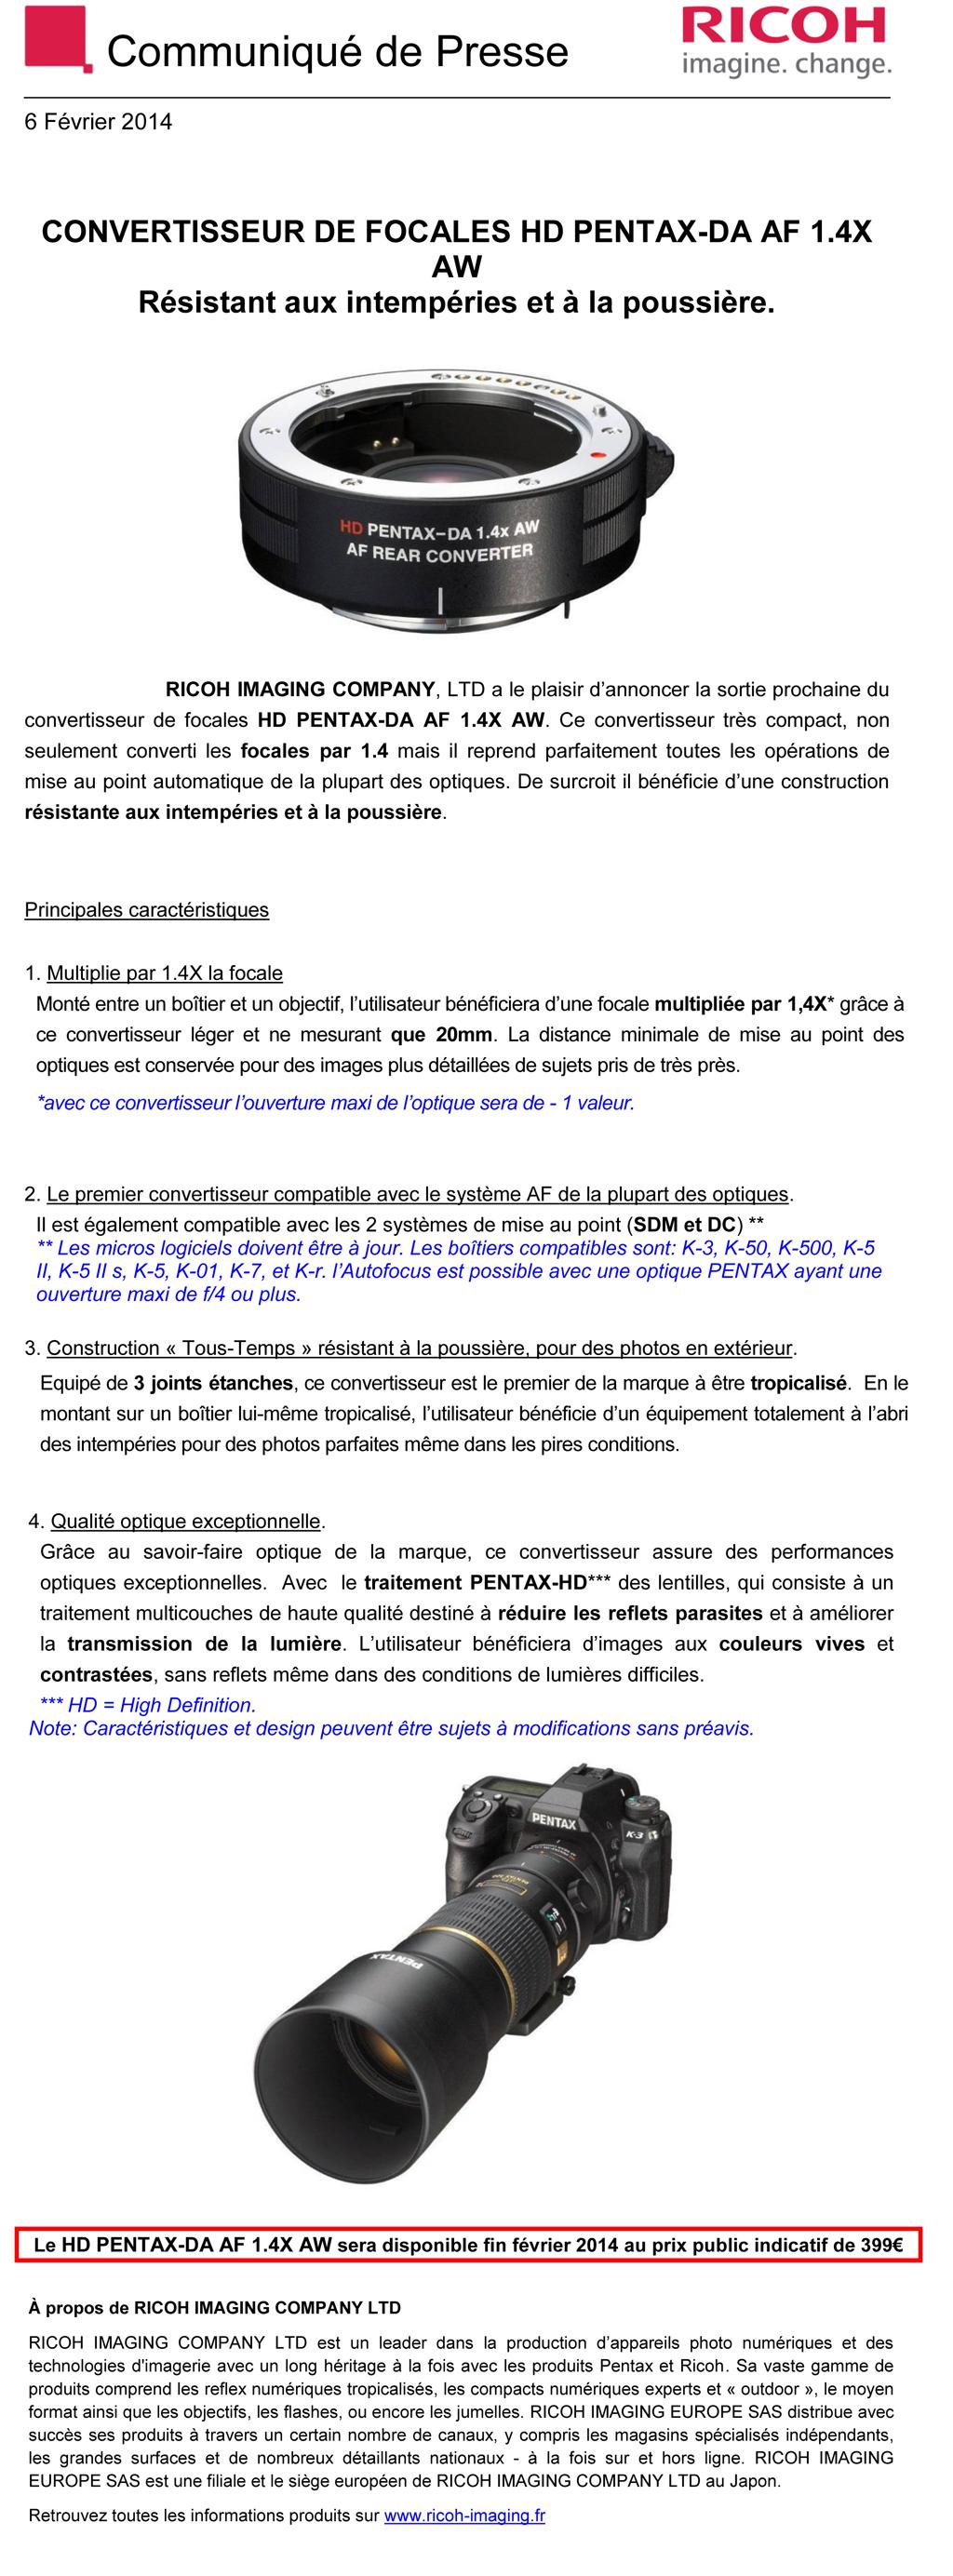 PENTAX RICOH IMAGING - Communiqué de Presse 06/02/2014 - CONVERTISSEUR DA AF 1.4X AW 4q9o